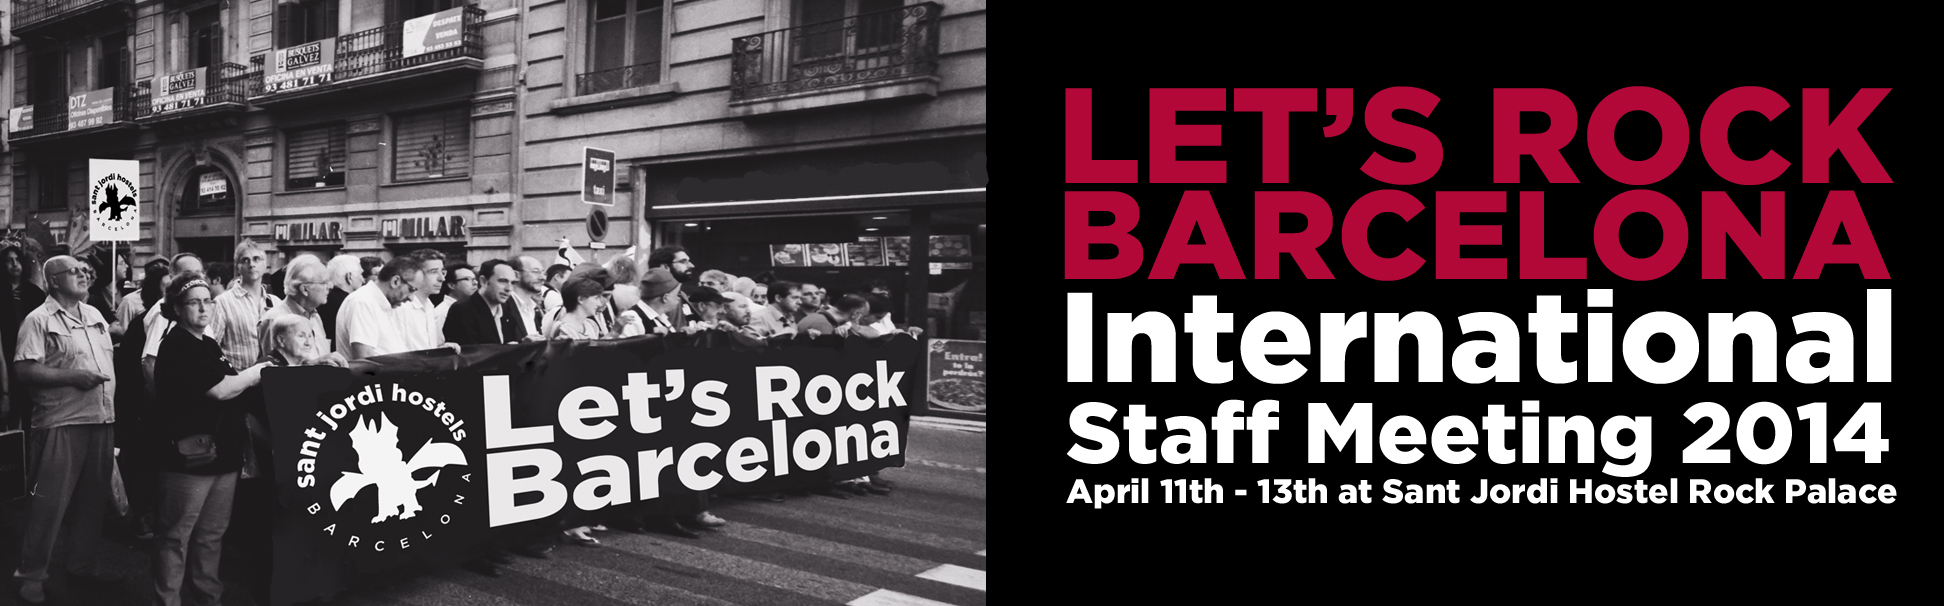 international hostel staff meeting 2014 Lets rock Barcelona